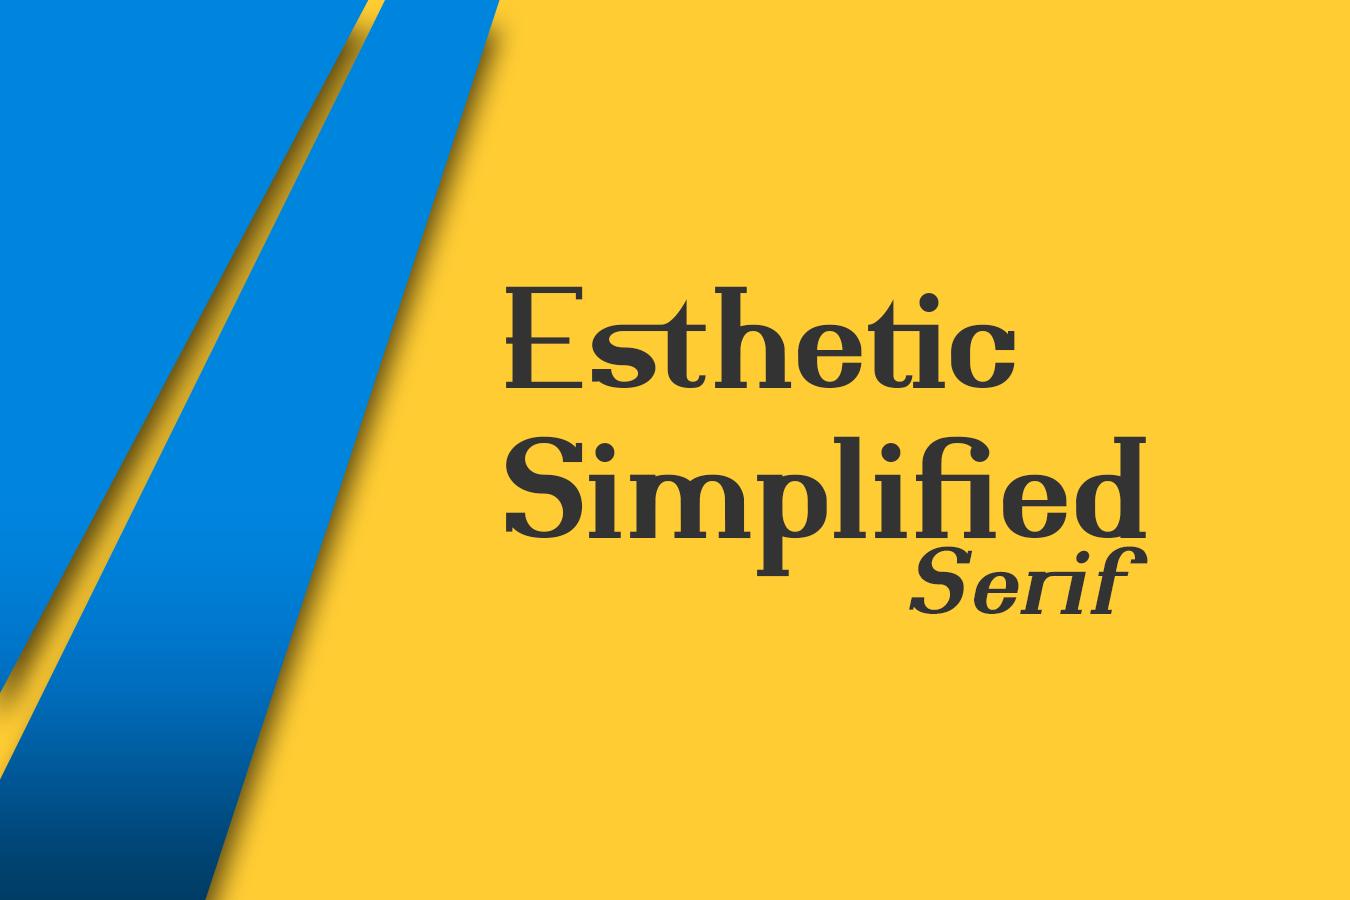 Esthetic Simplified Serif example image 1